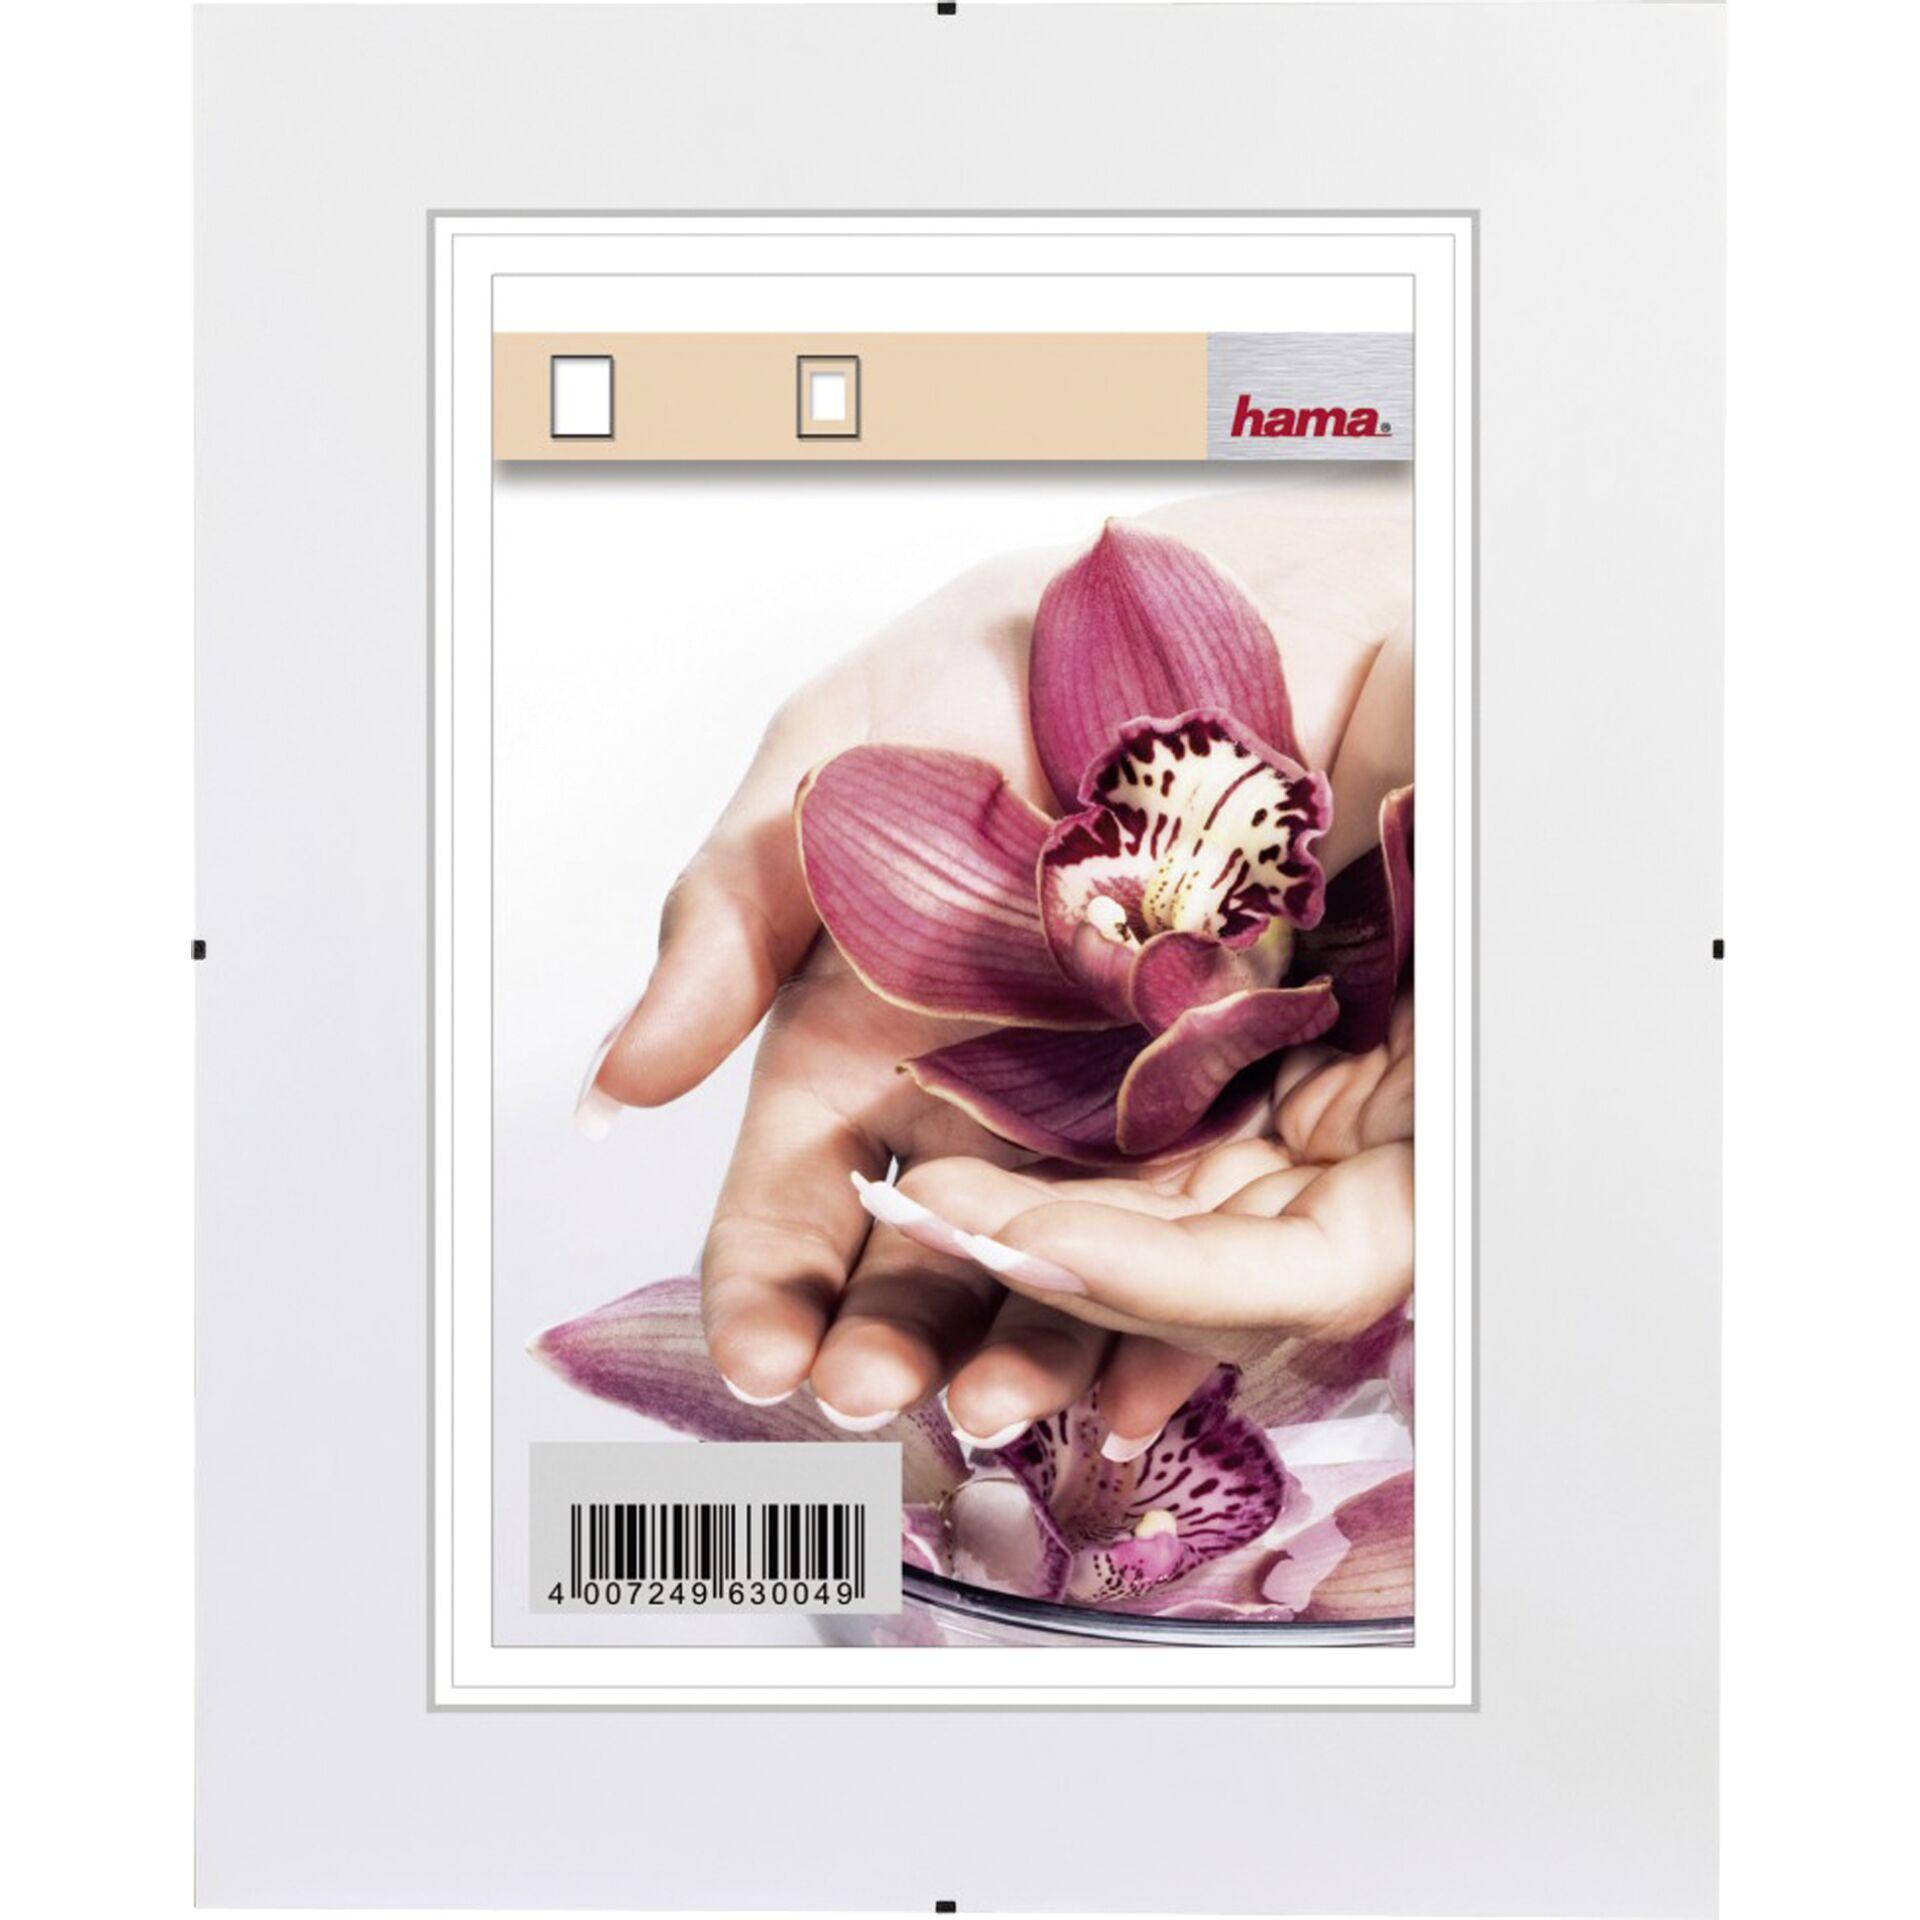 Hama Clip-Fix NG           24x30 rahmenloser Bildhalter     63022